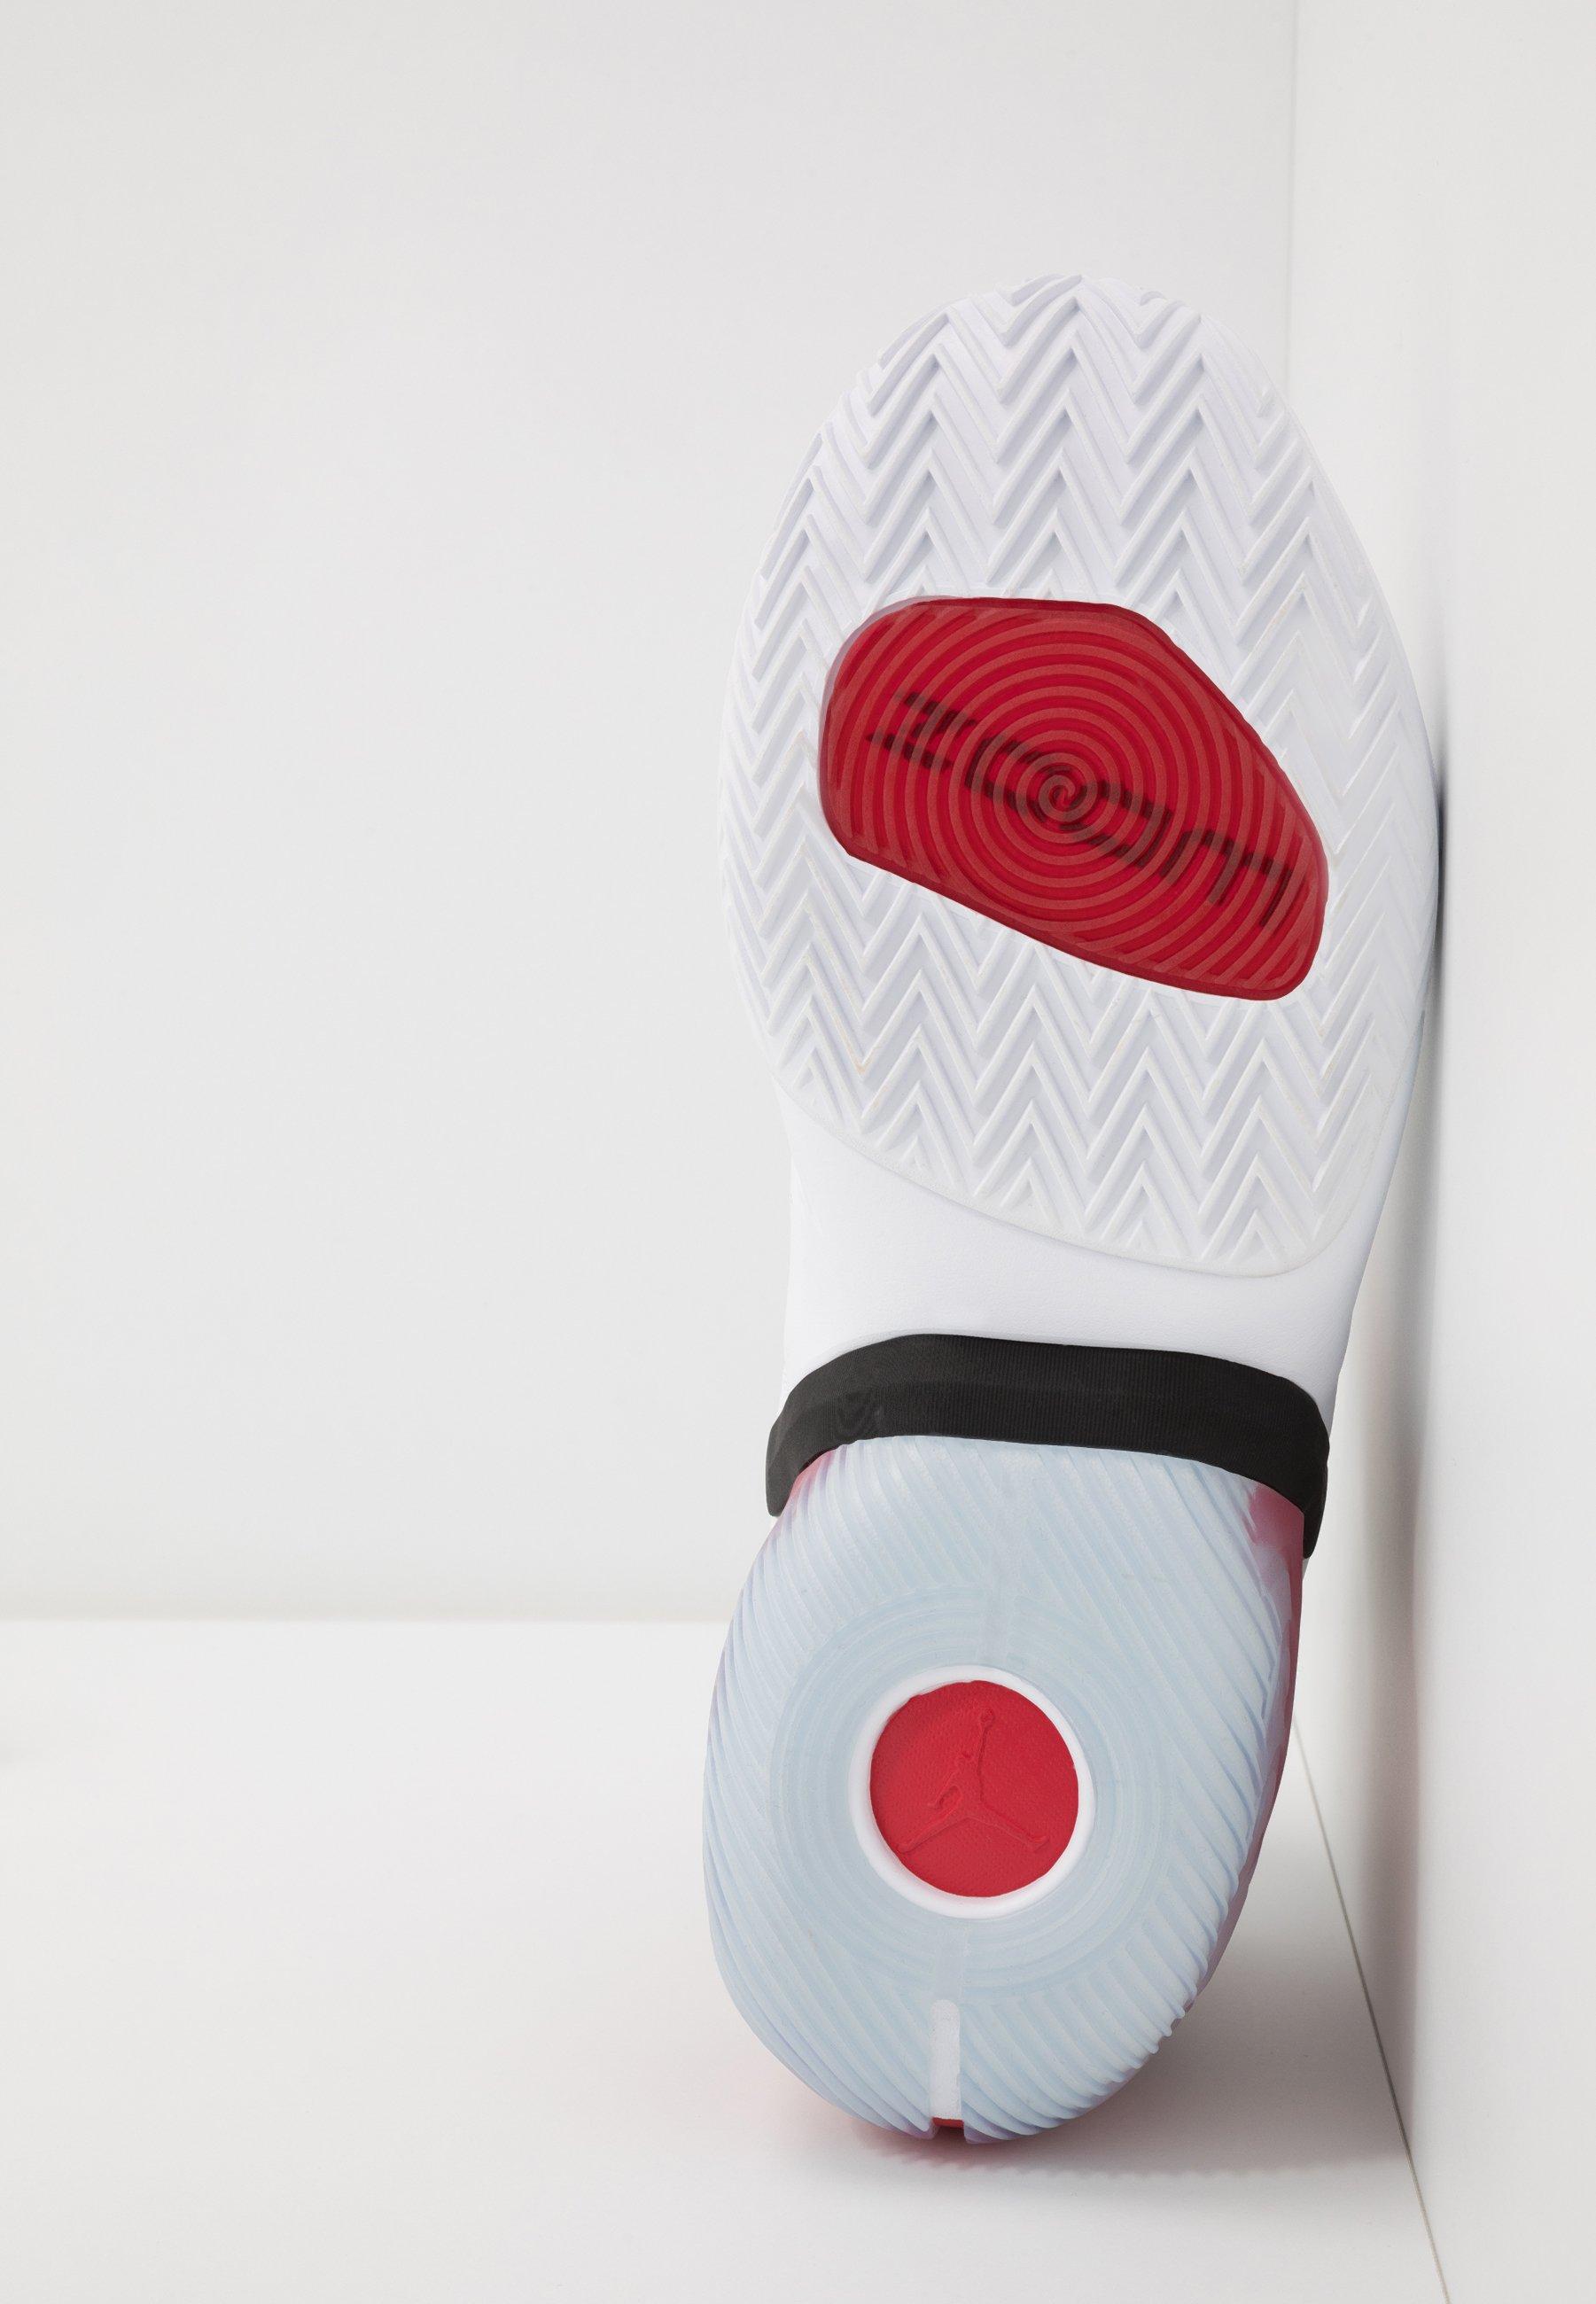 Jordan REACT ELEVATION - Zapatillas de baloncesto - white/black/university red - Calzado de hombre